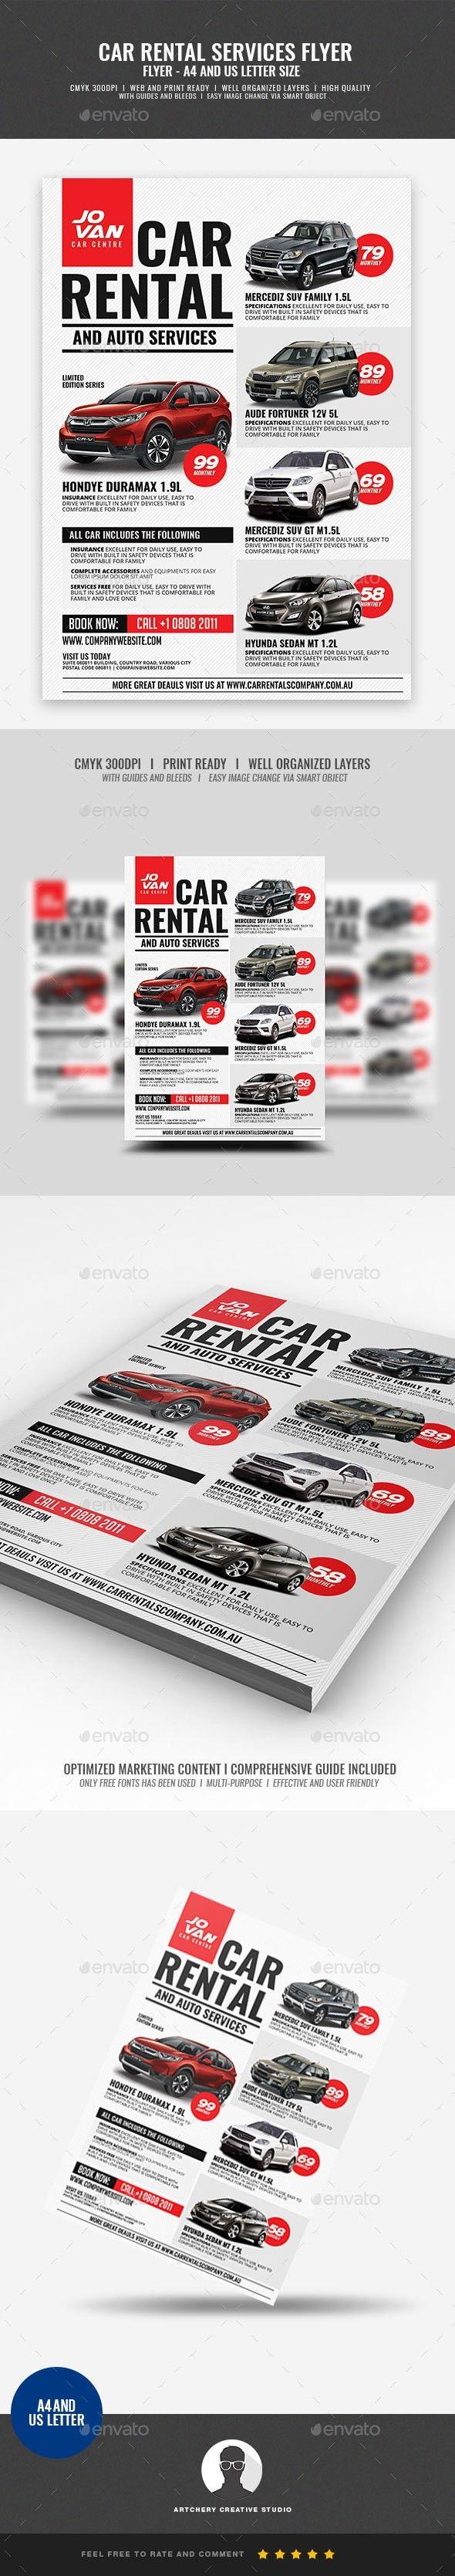 a4 flyer advertisement automobile car car for hire car for rent